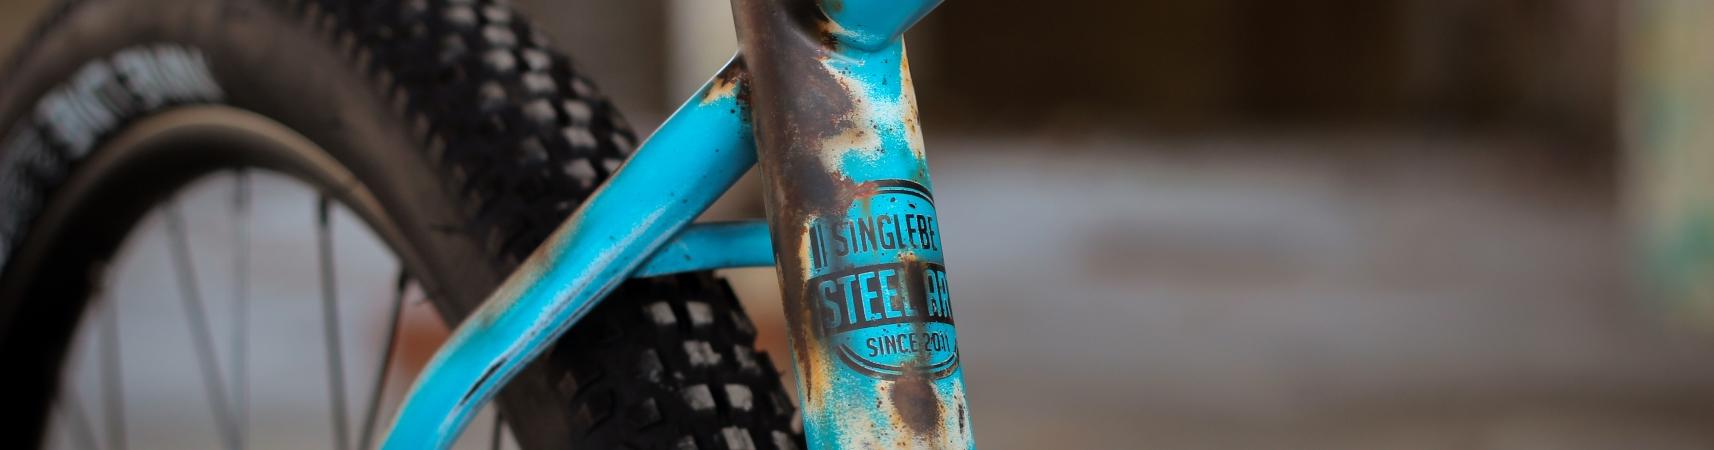 SingleBe Rusty